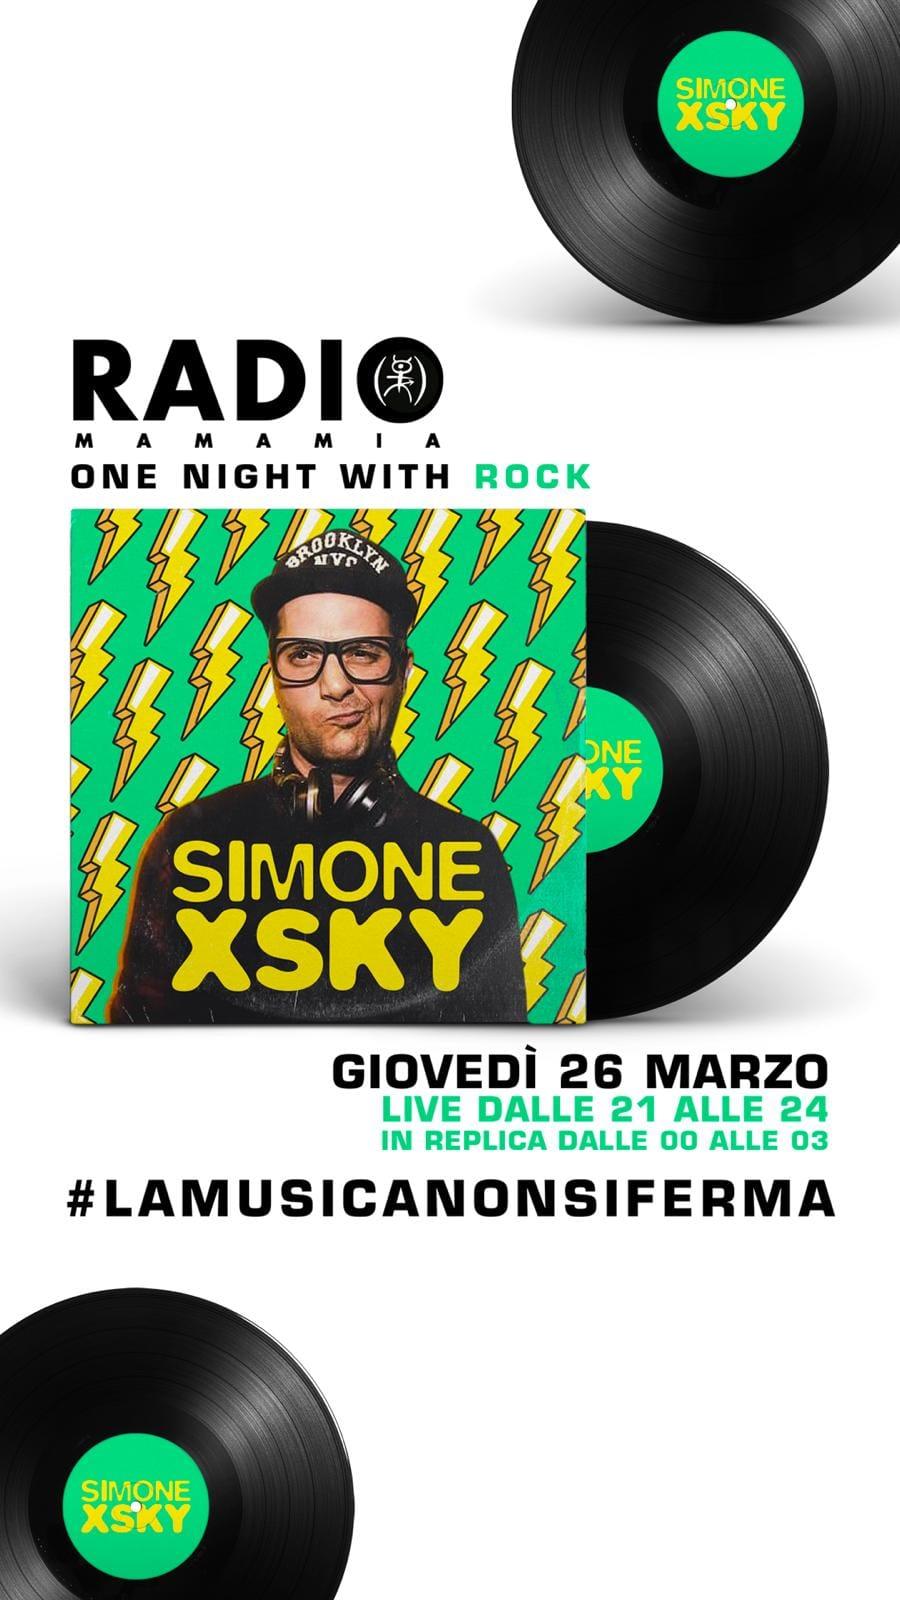 One night with rock Radio Mamamia